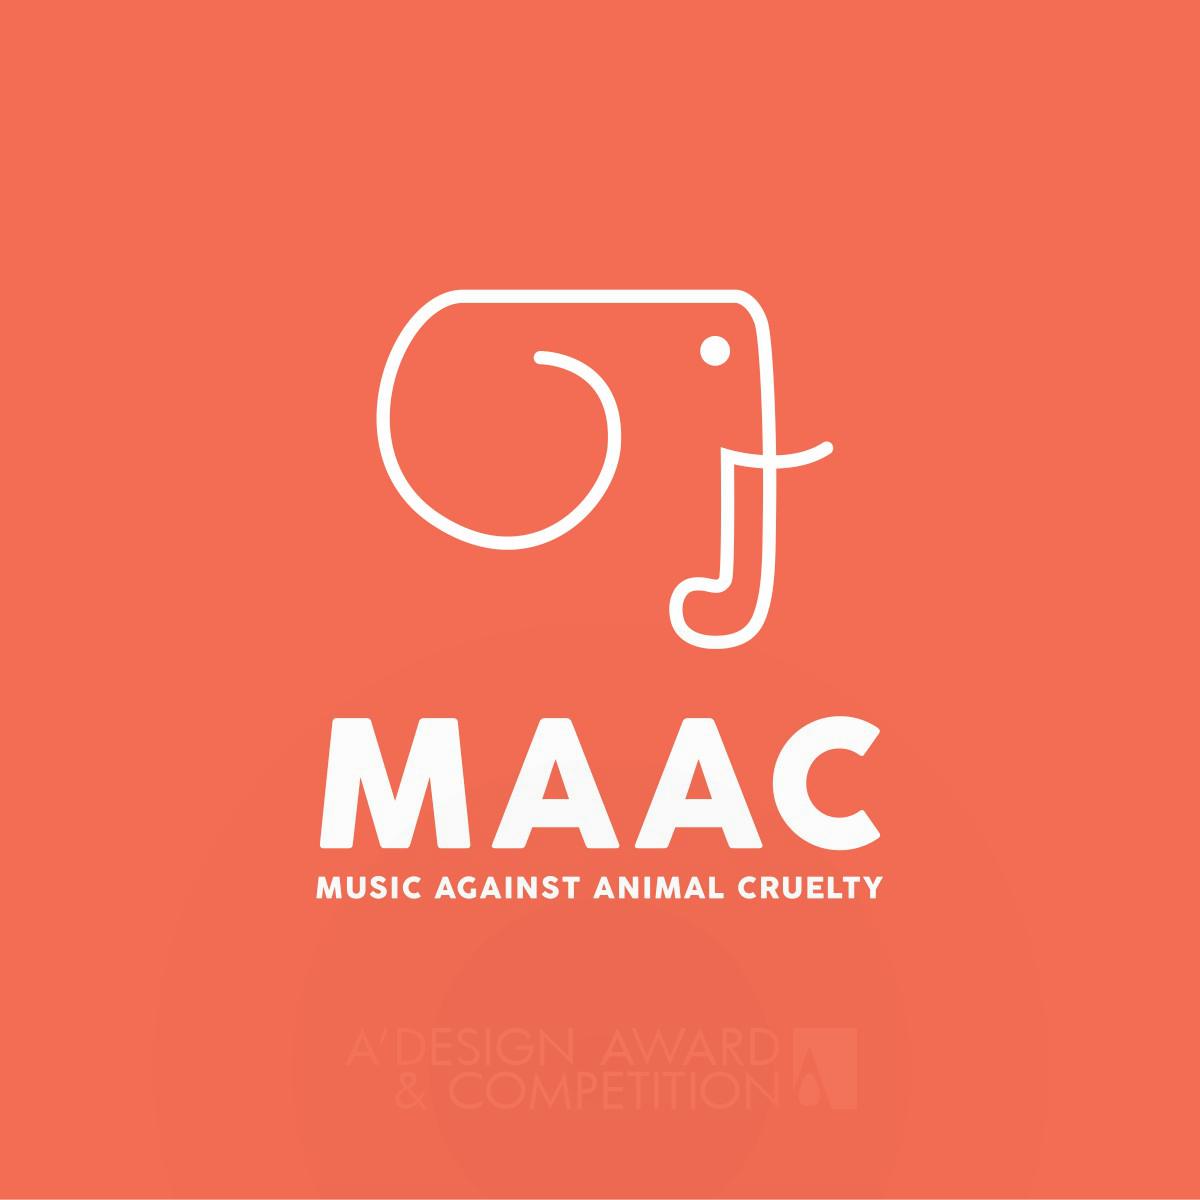 Music Against Animal Cruelty (MAAC) Logo